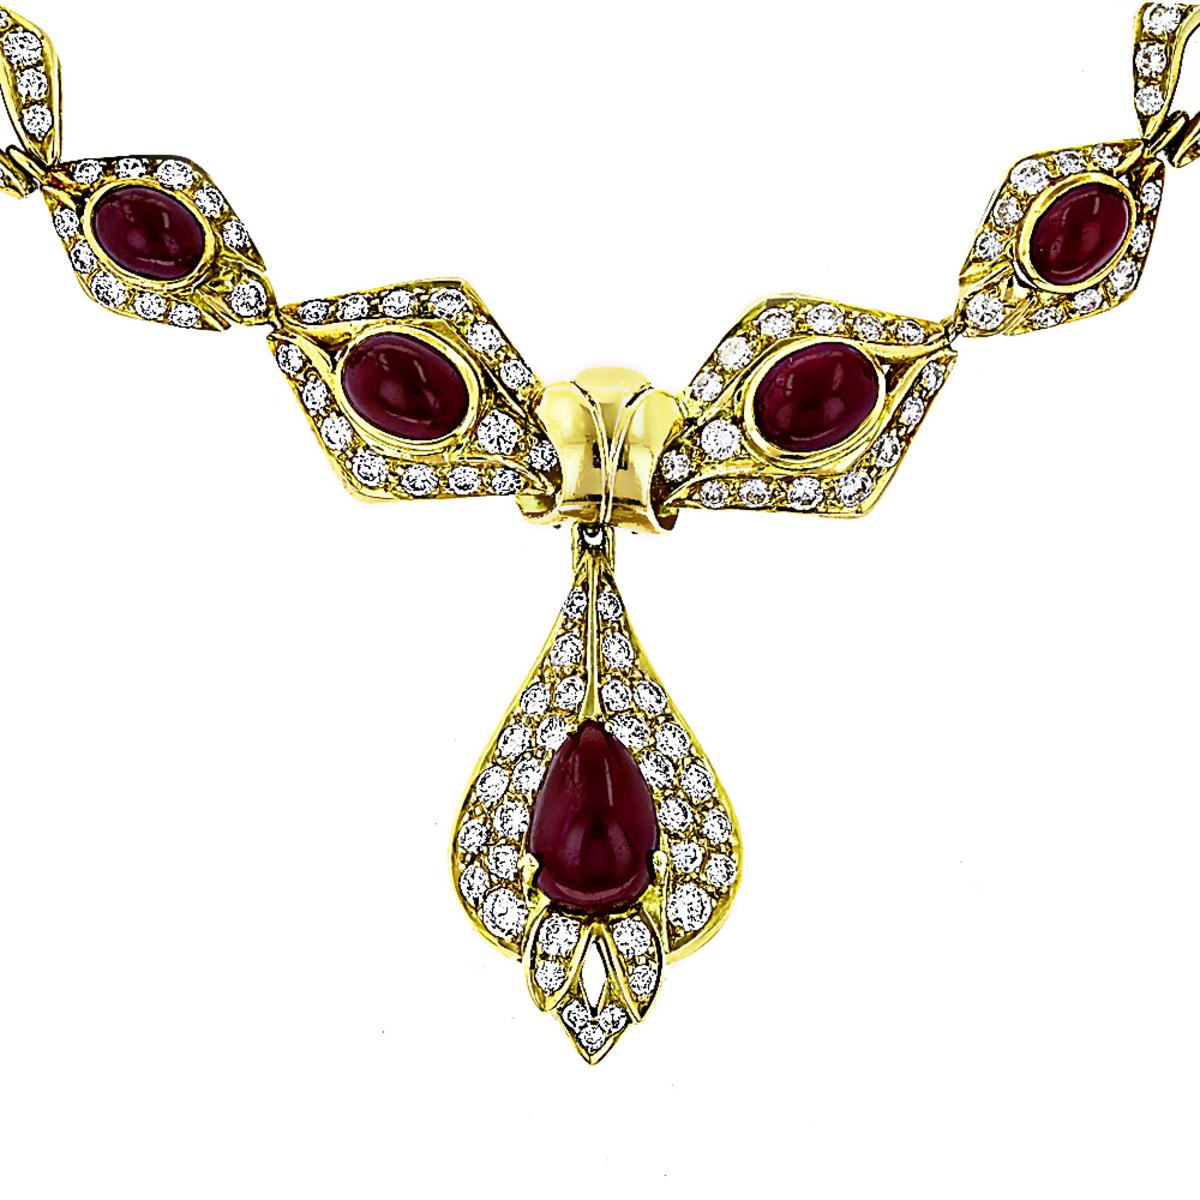 Estate Jewelry Sale 18K Yellow Gold Ladies Vintage Ruby & Diamond Necklace